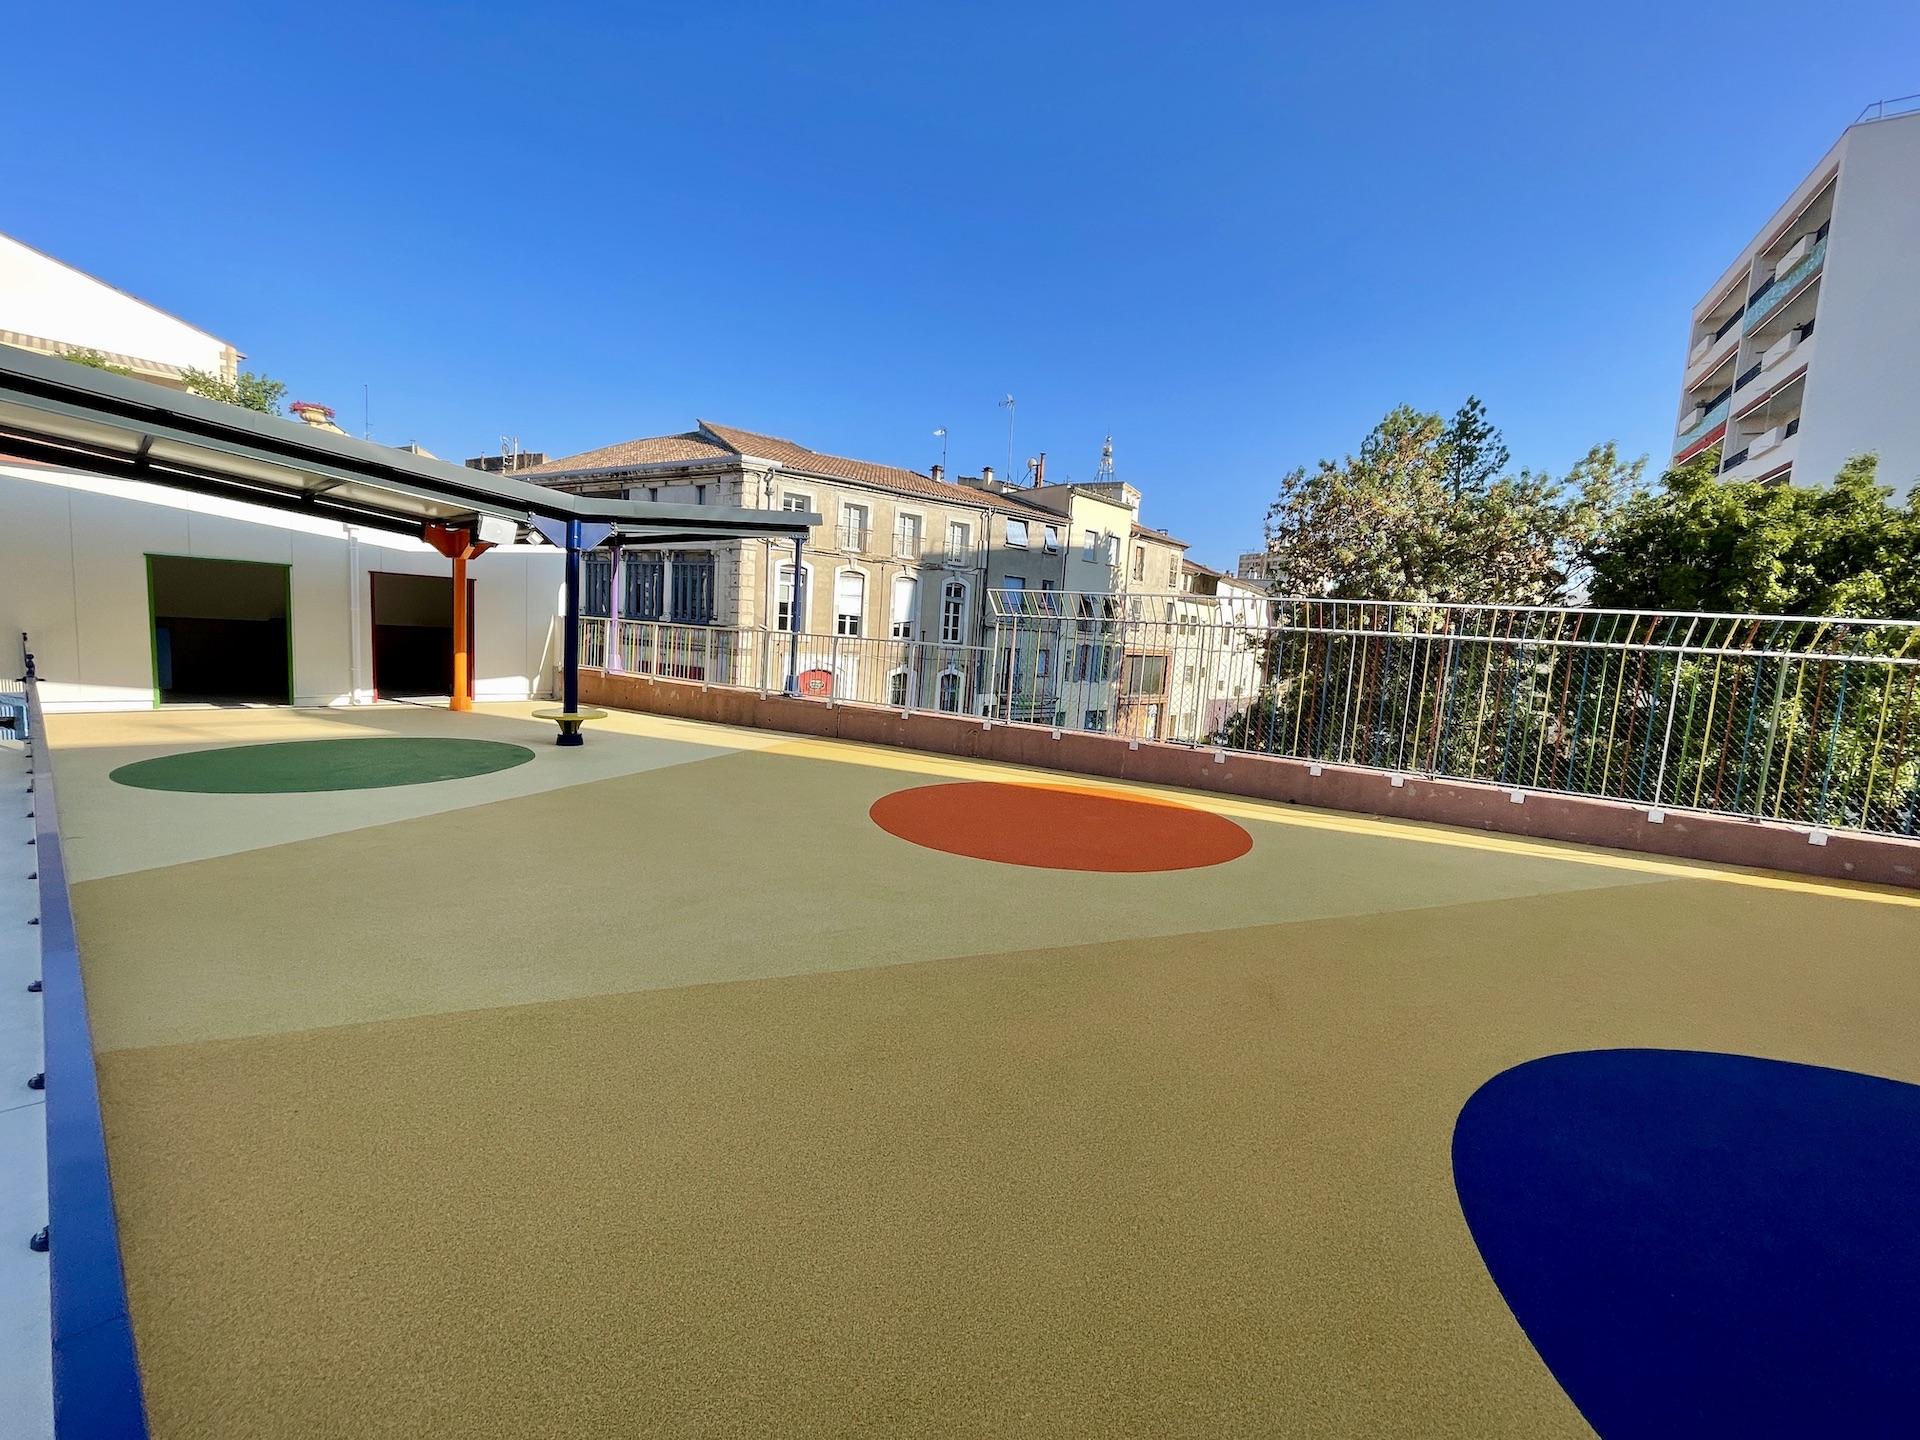 sol amortissant école maternelle Gard 30 PLAYTIL